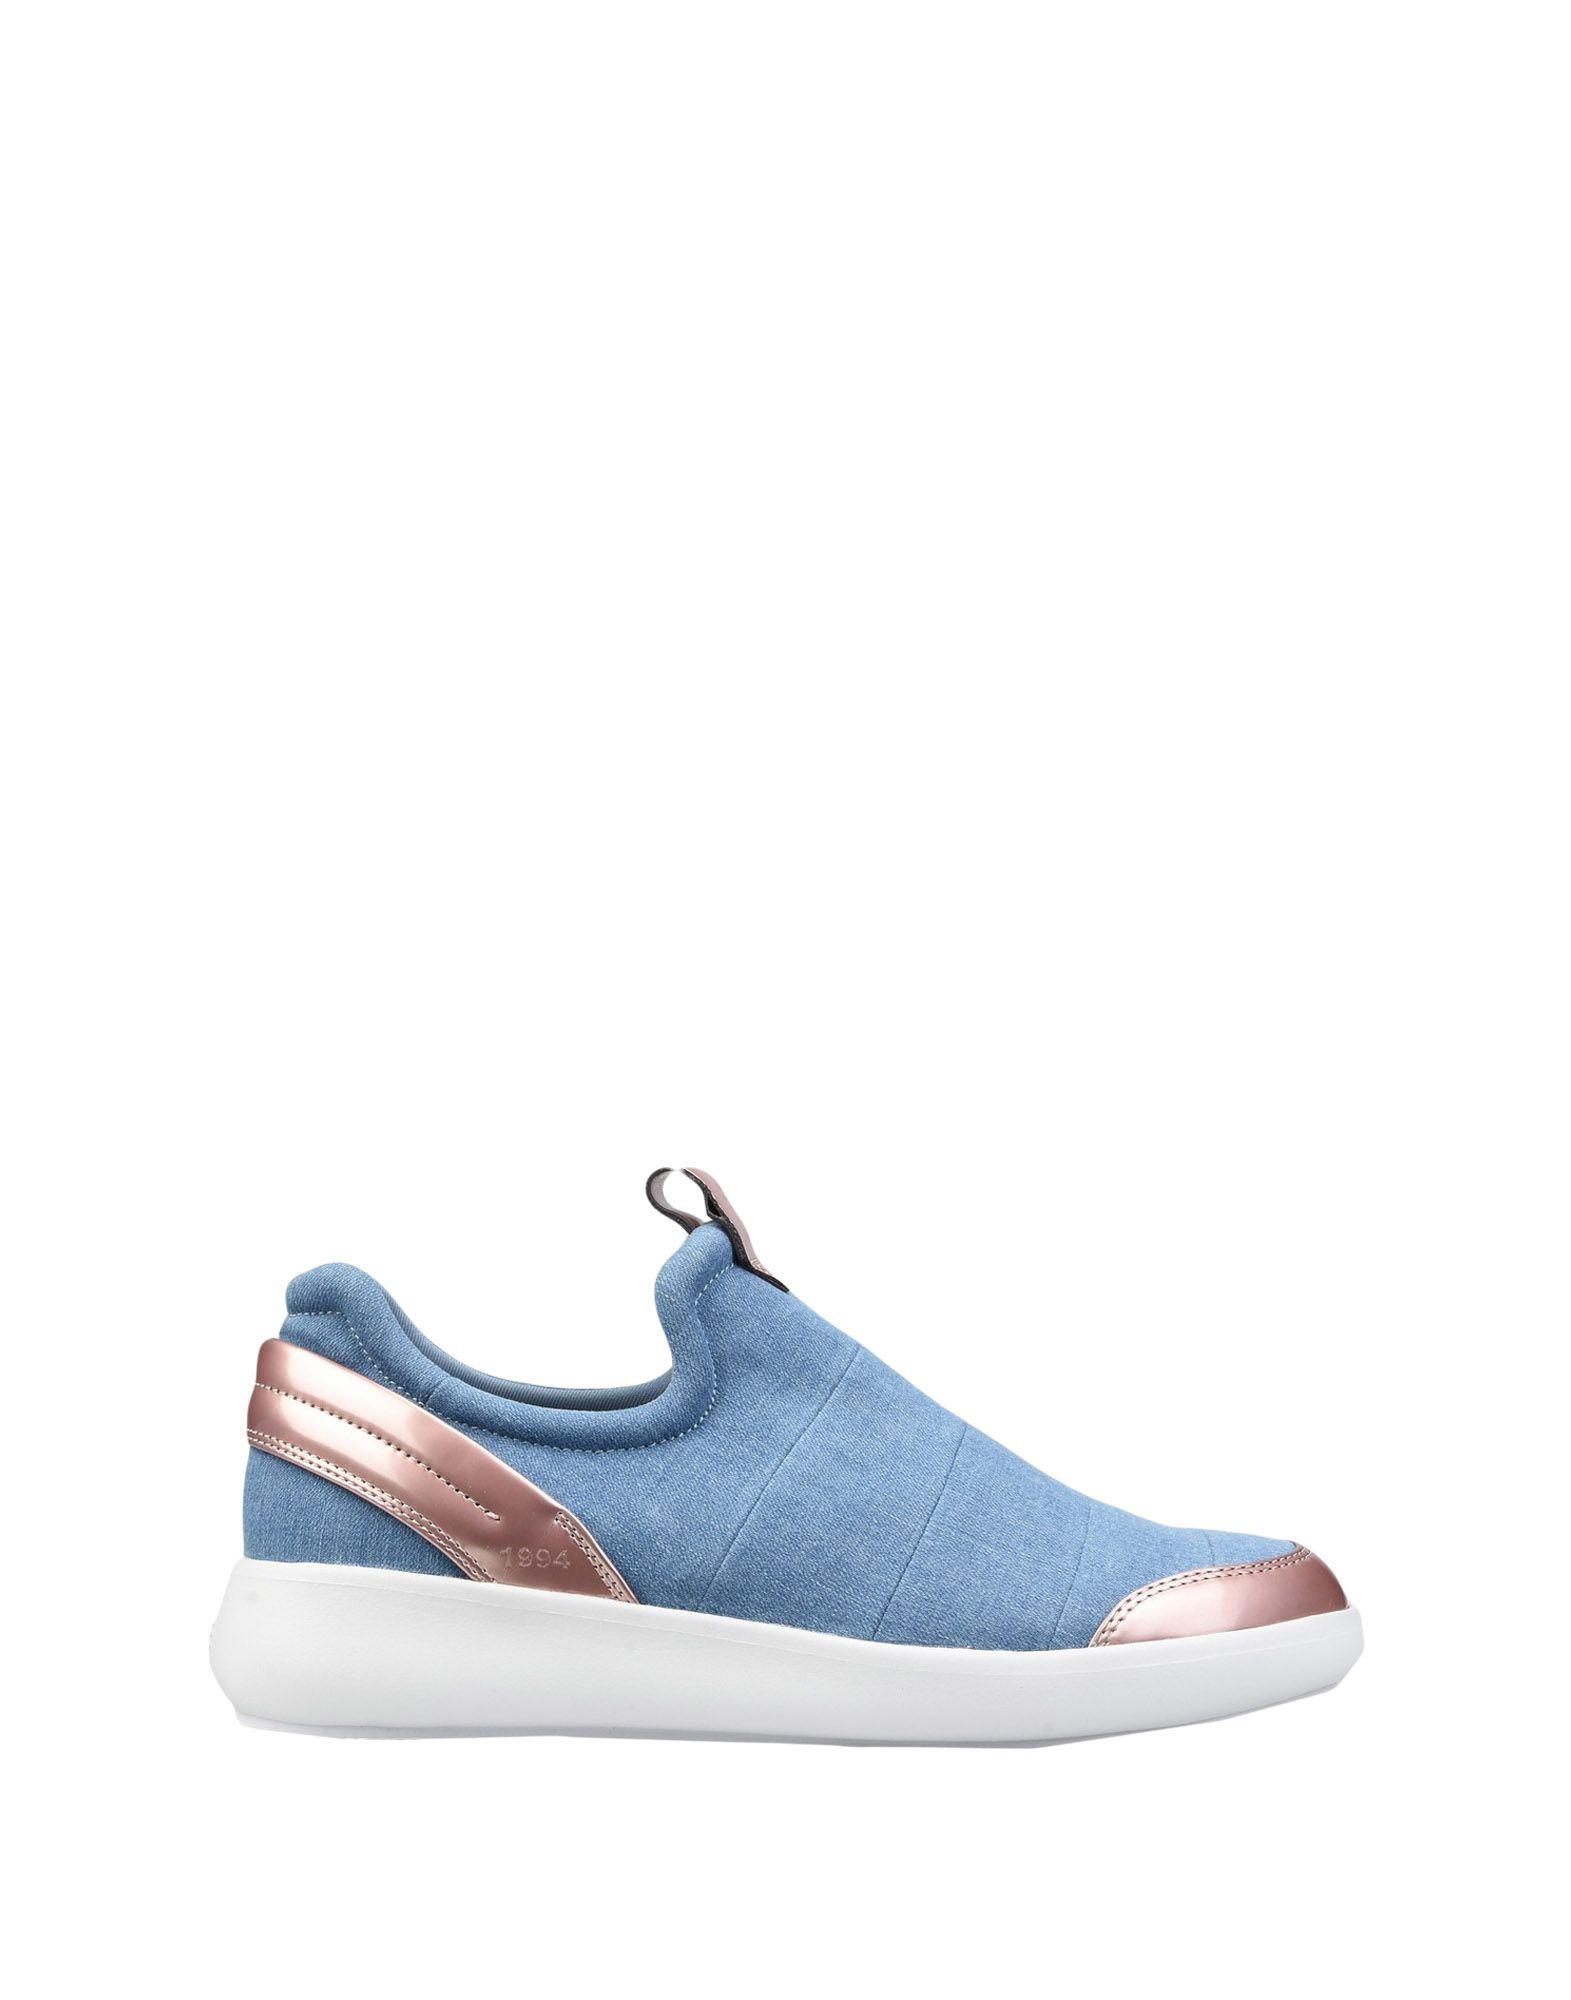 Clone Moonstone Gute  11247456AT Gute Moonstone Qualität beliebte Schuhe 95d762